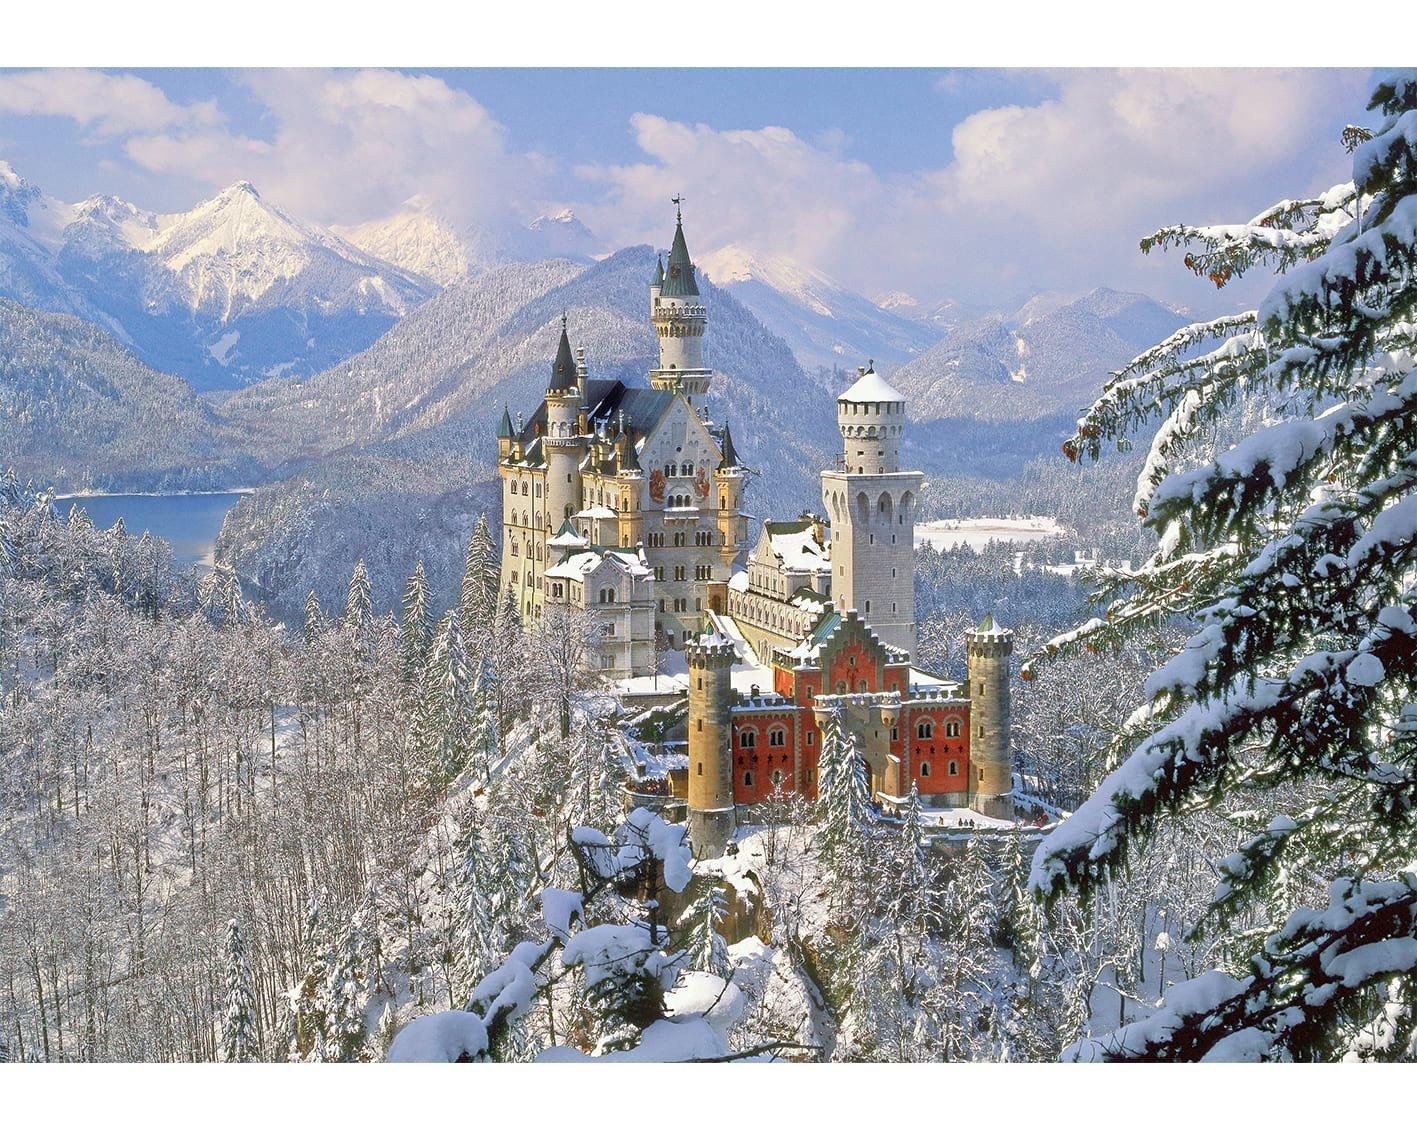 The Best Winter Scene